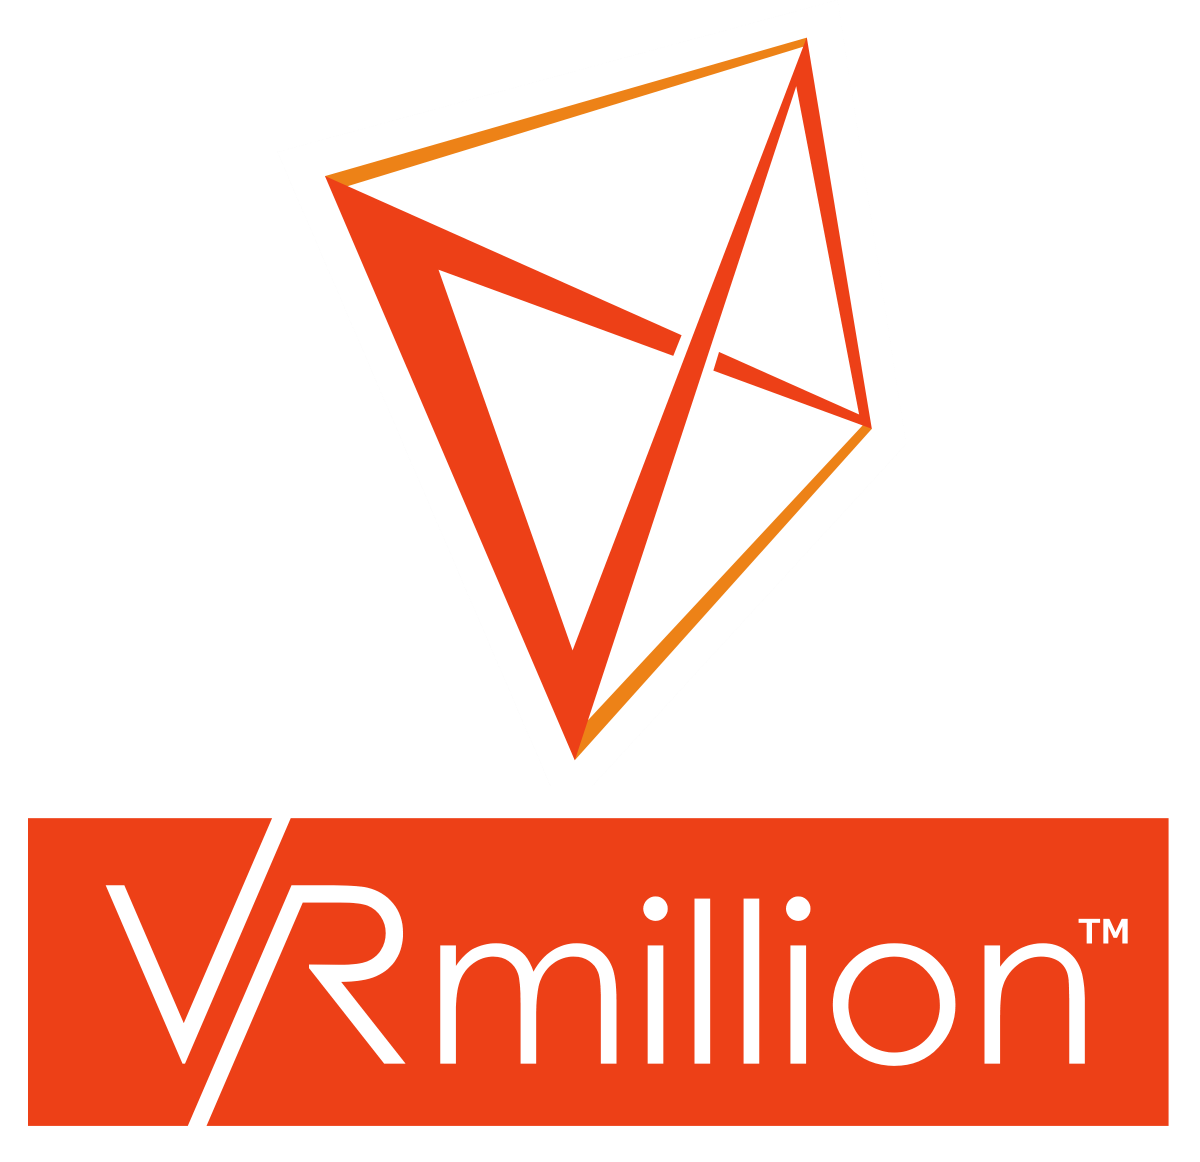 VRmillionロゴ